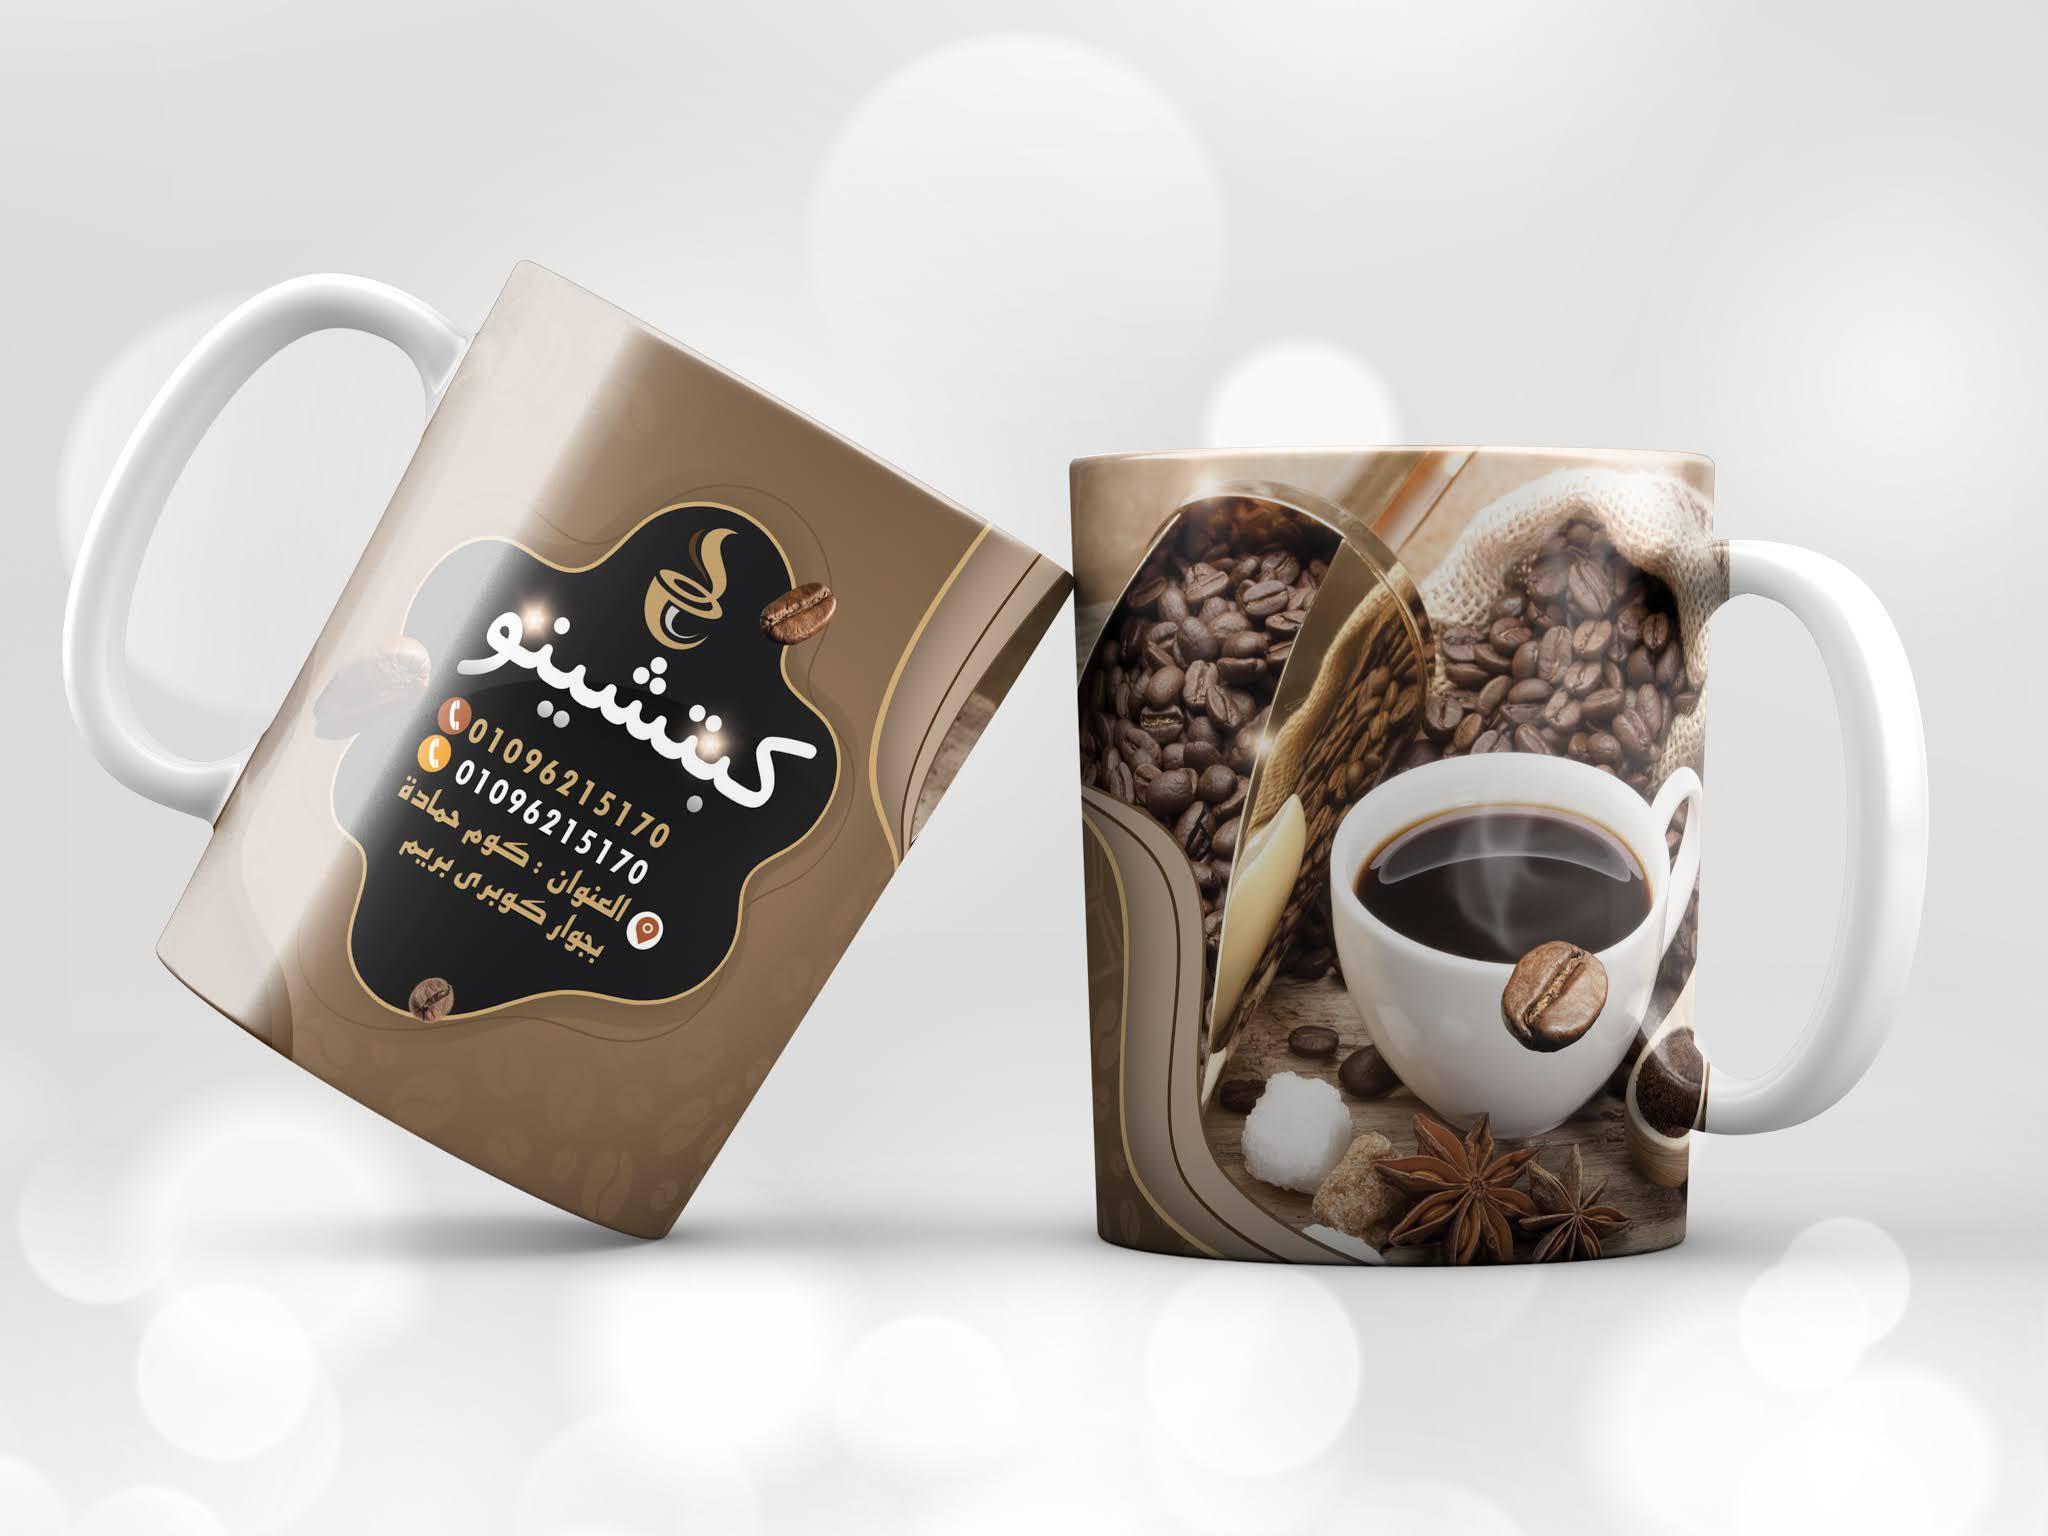 Download printing designs on mugs and mugs, group No. 1, free download